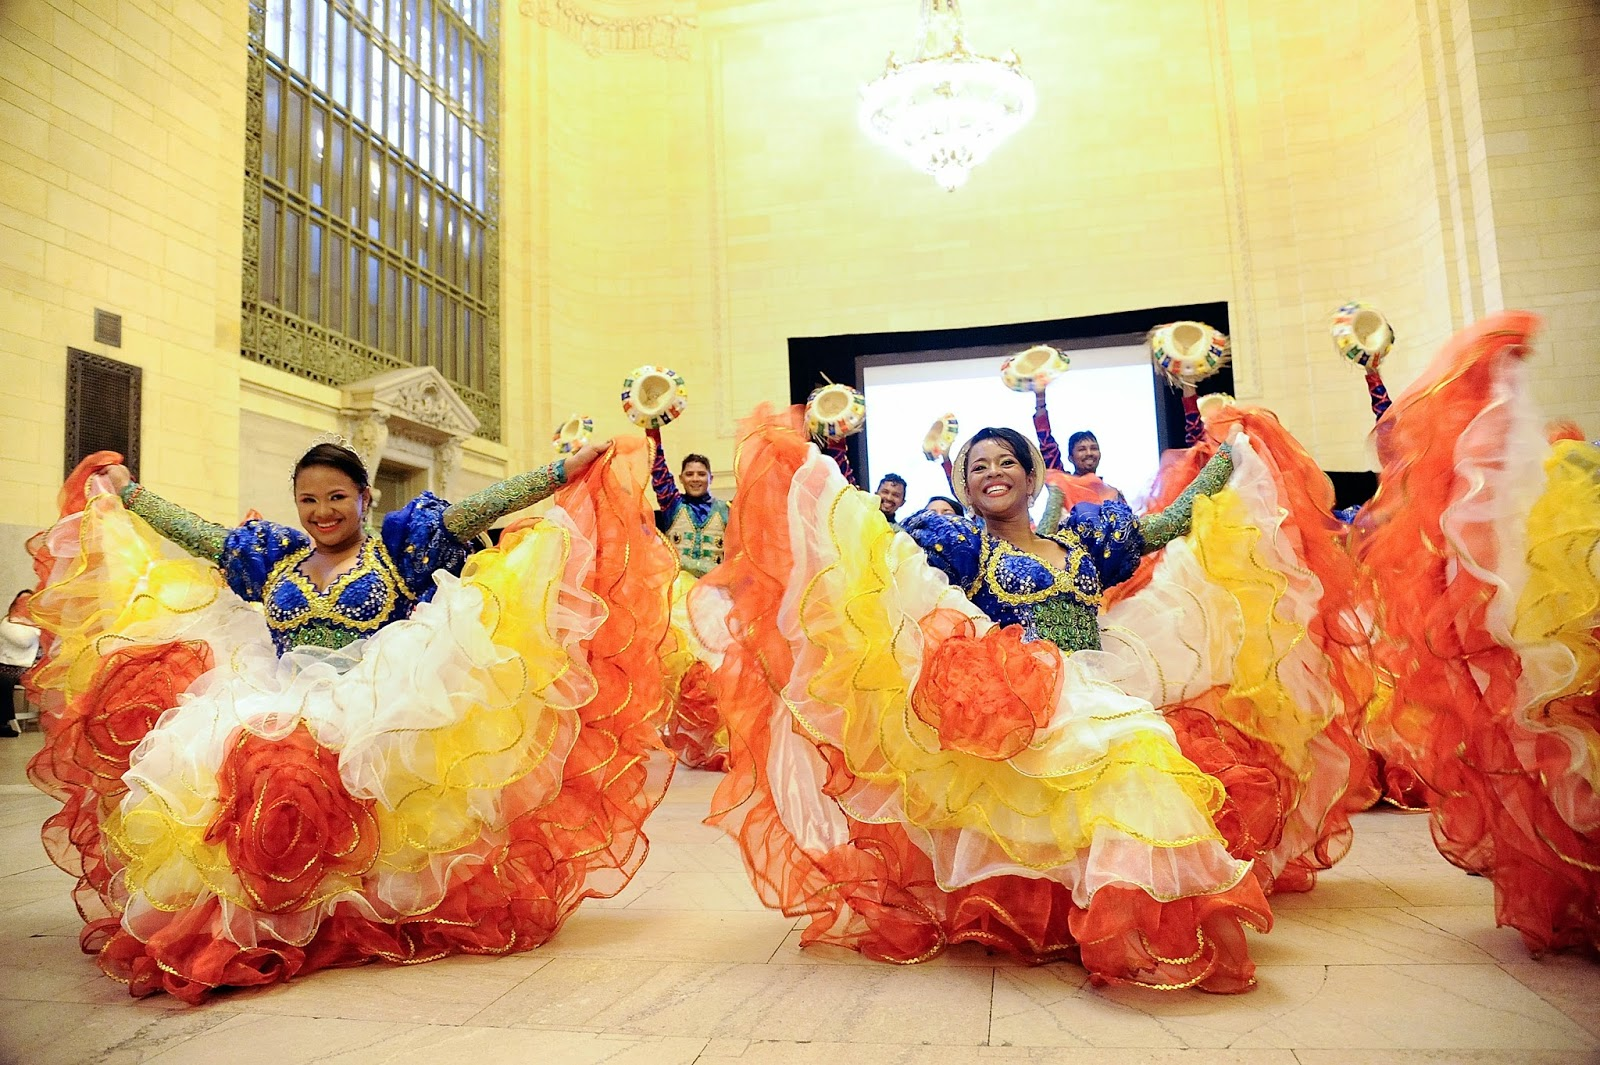 Boa Vista June Festival, Brazil, Dancers, Entertainment, Grand Central Terminal, New York, Offbeat, Quadrille Dance, Quadrille Dancers, Showbiz, USA,